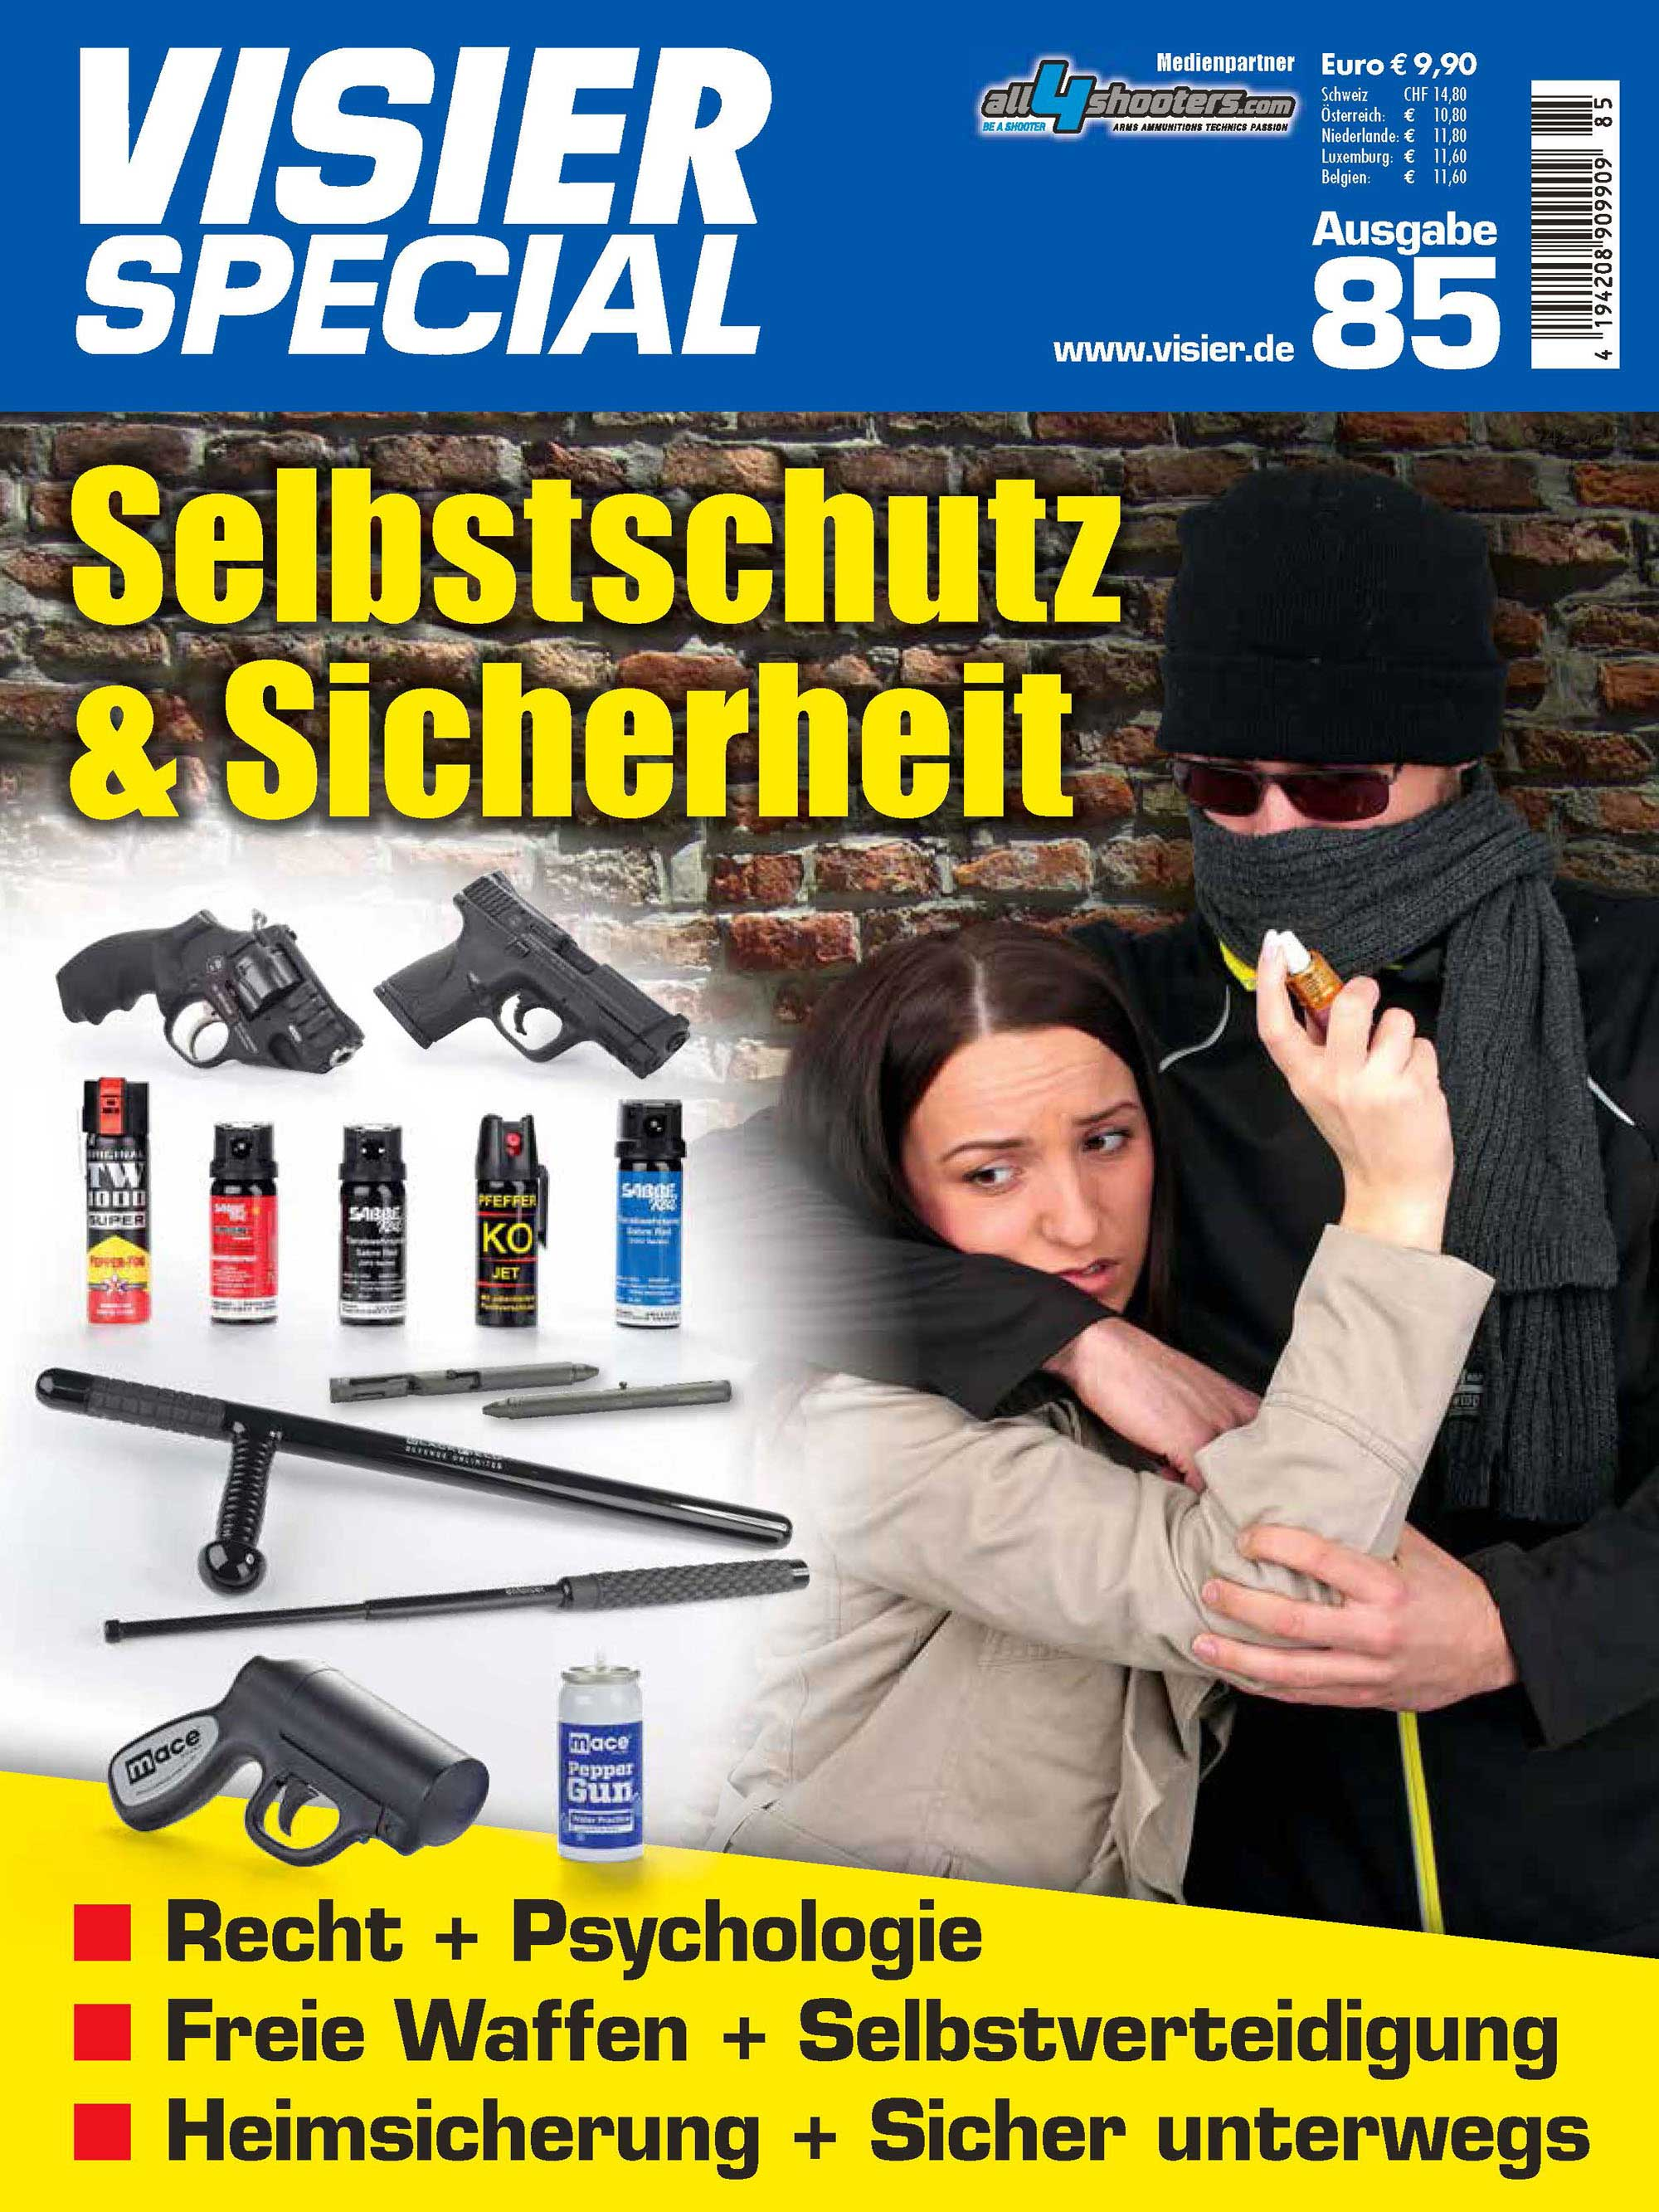 VISIER Special 85